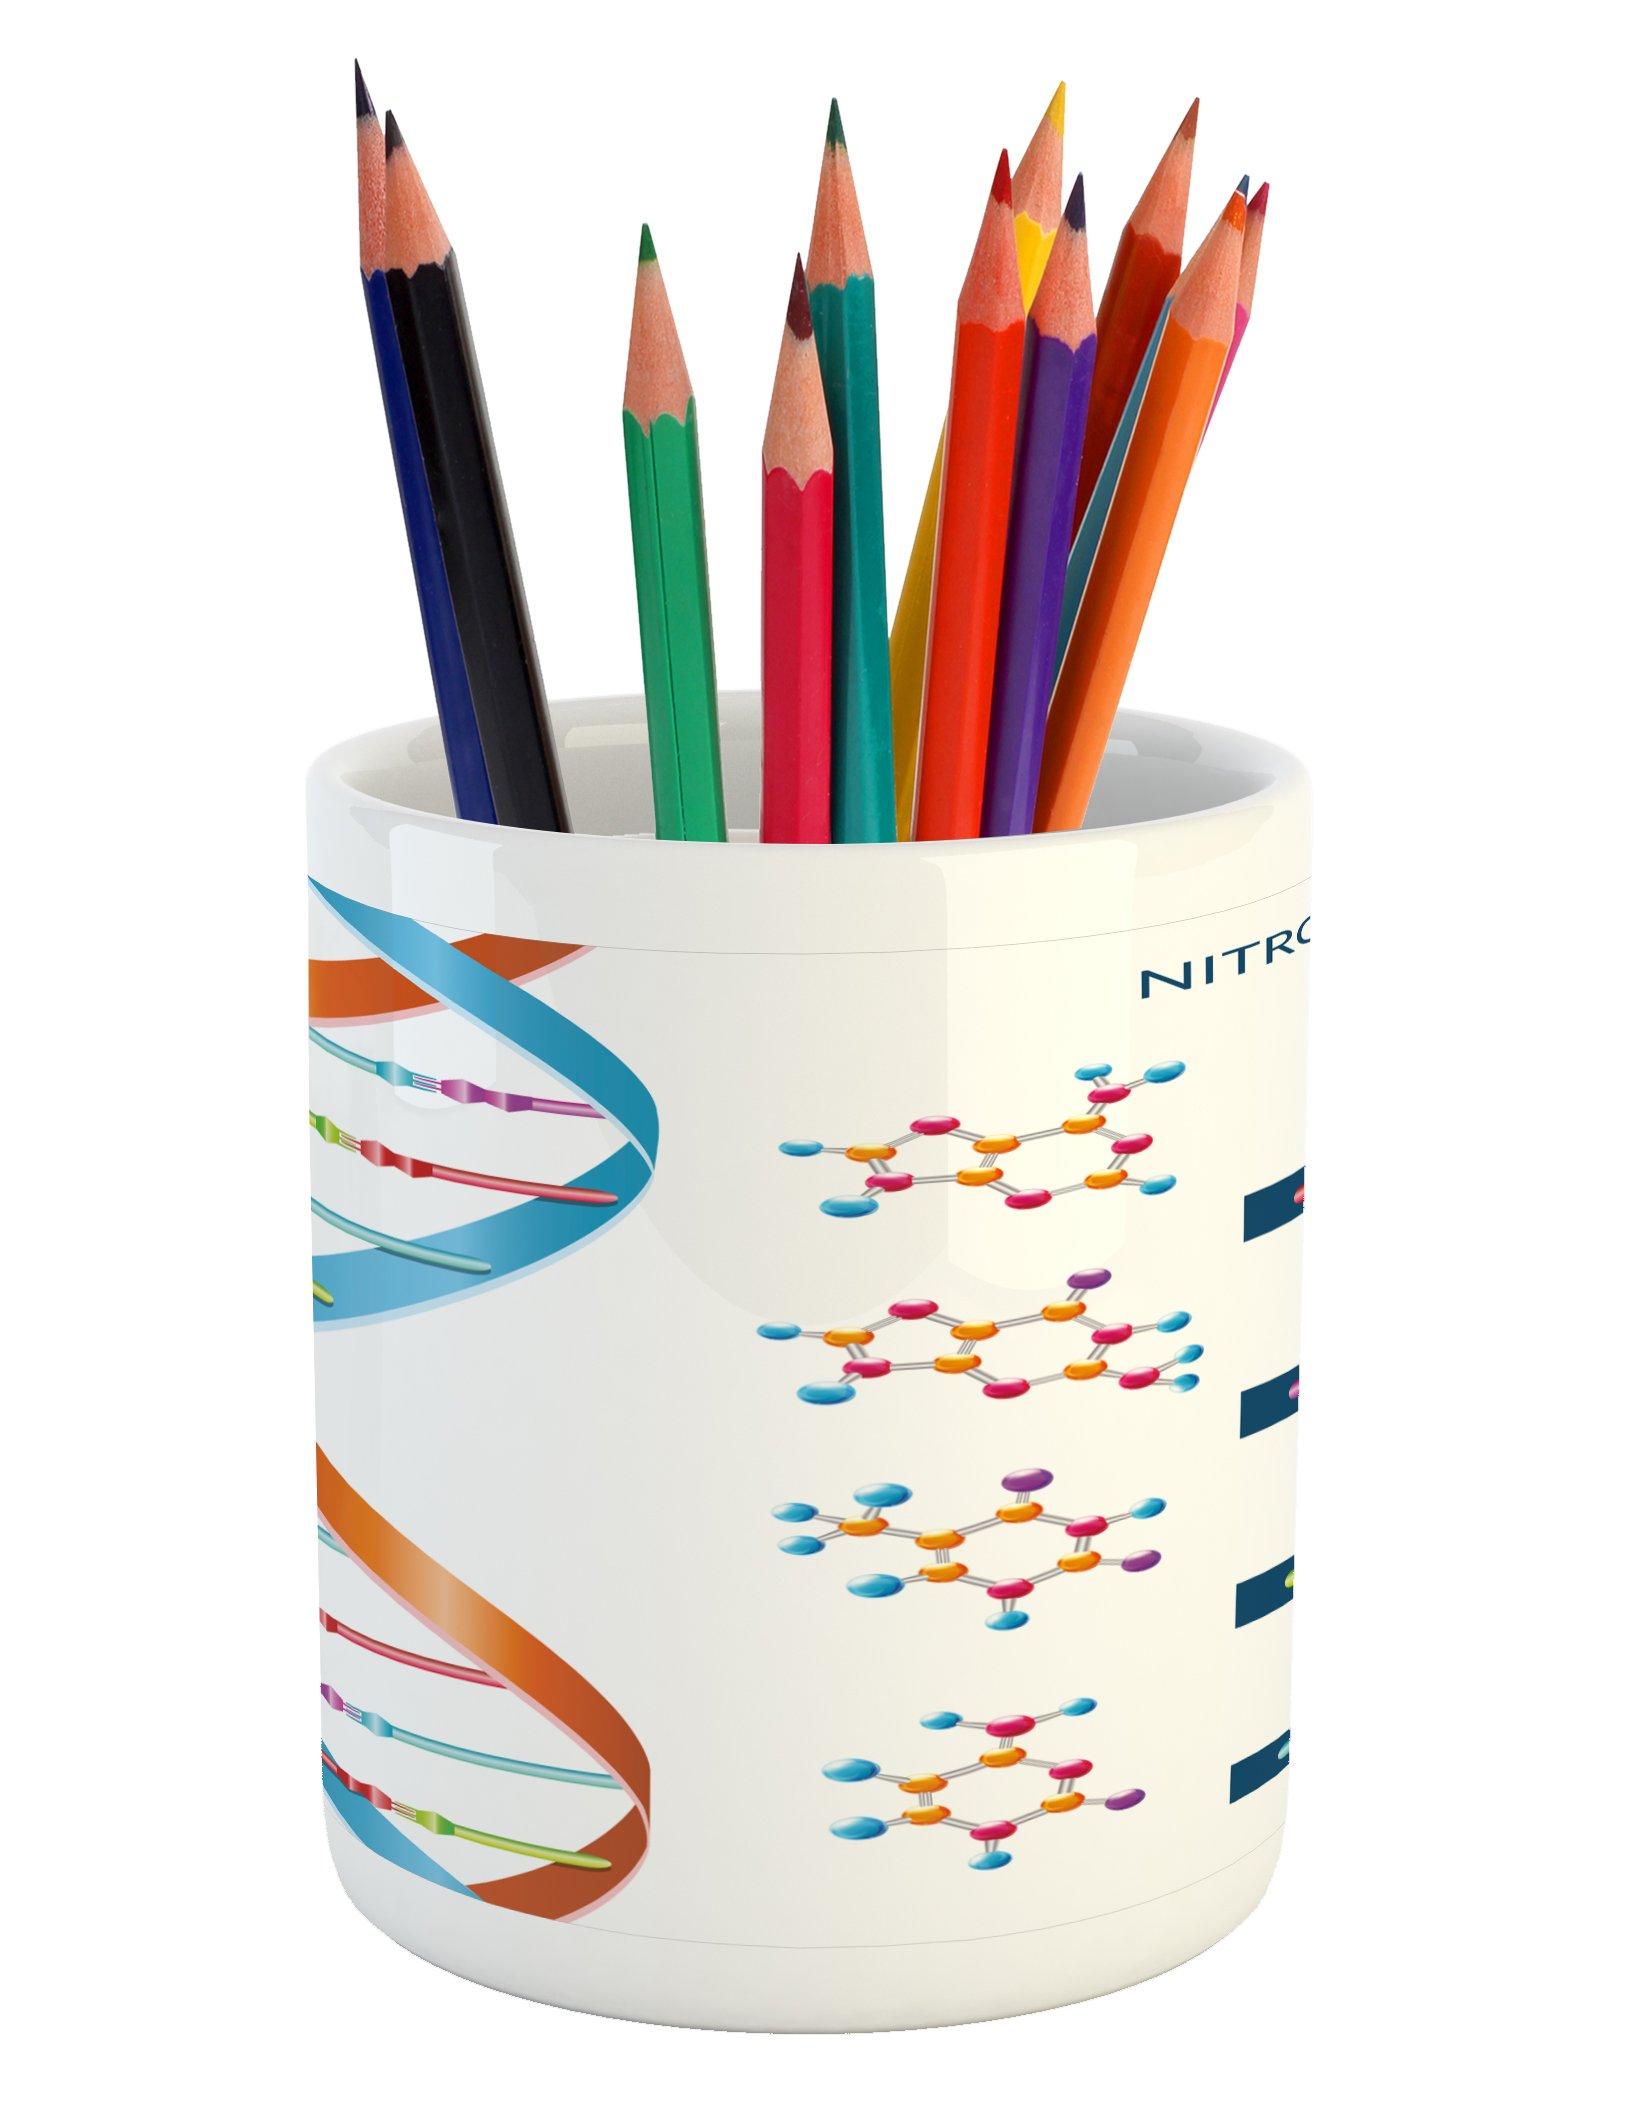 Ambesonne Educational Pencil Pen Holder, DNA Bases Chemistry Biochemistry Biotechnology Science Spiral Symbol Genetic, Printed Ceramic Pencil Pen Holder for Desk Office Accessory, Multicolor